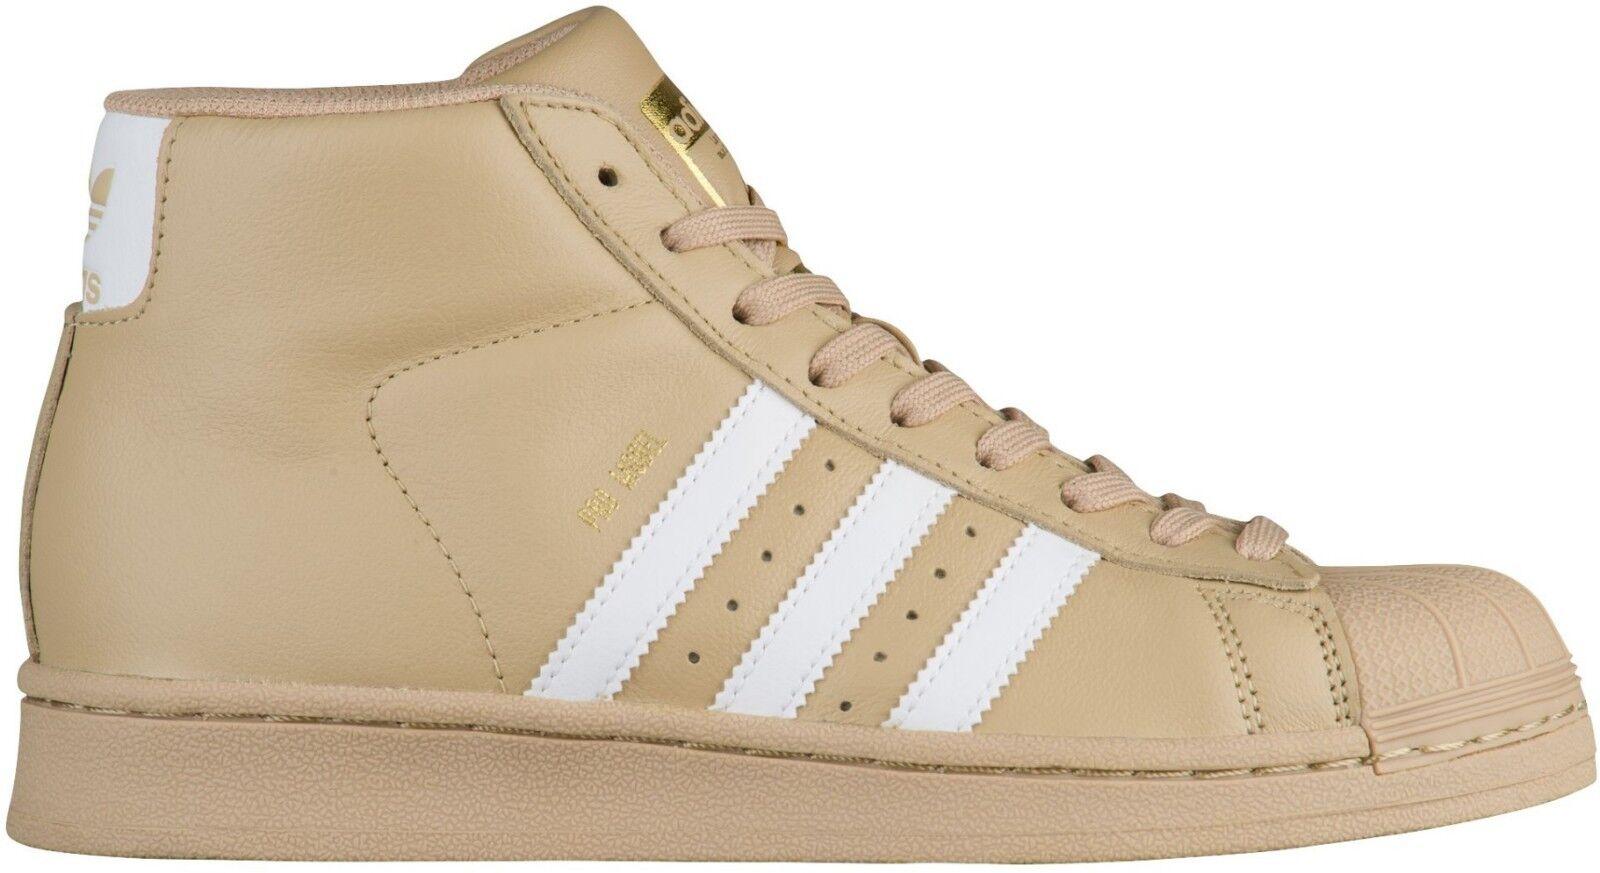 Adidas Originals Men's PRO MODEL shoes Linen Khaki White Metallic gold CG5072 b